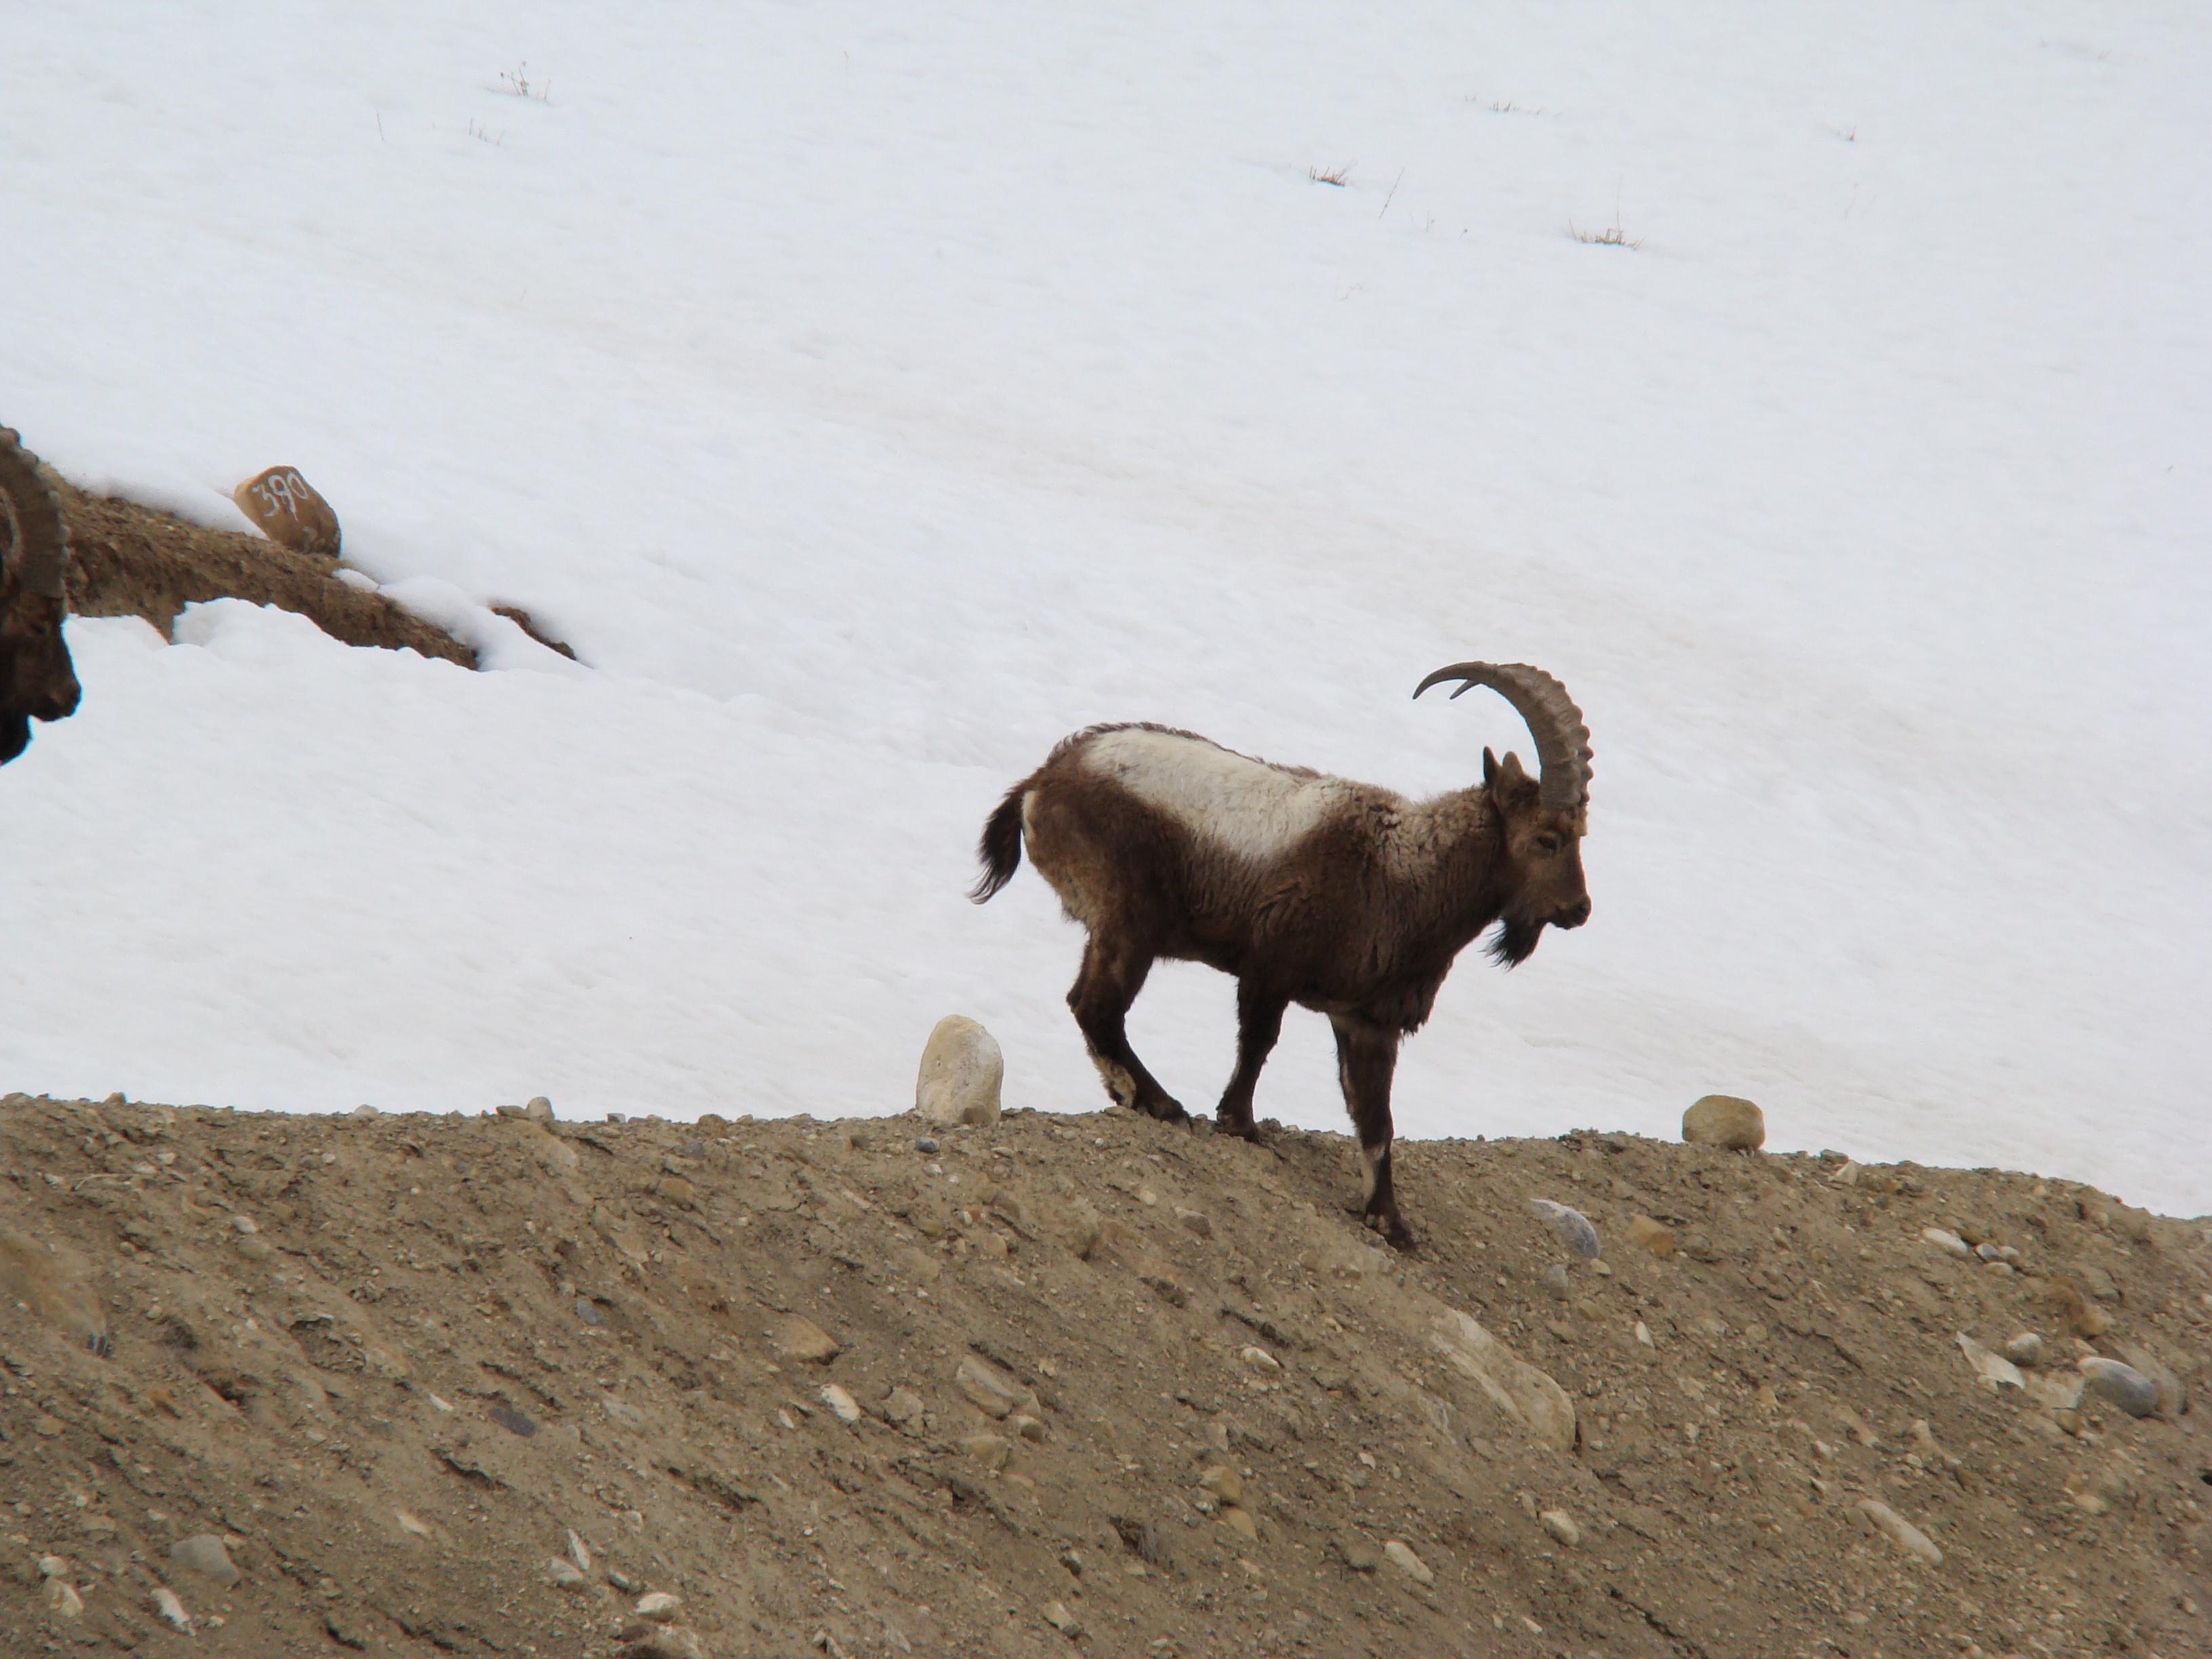 File:Siberian ibex (Capra sibirica) 01.JPG